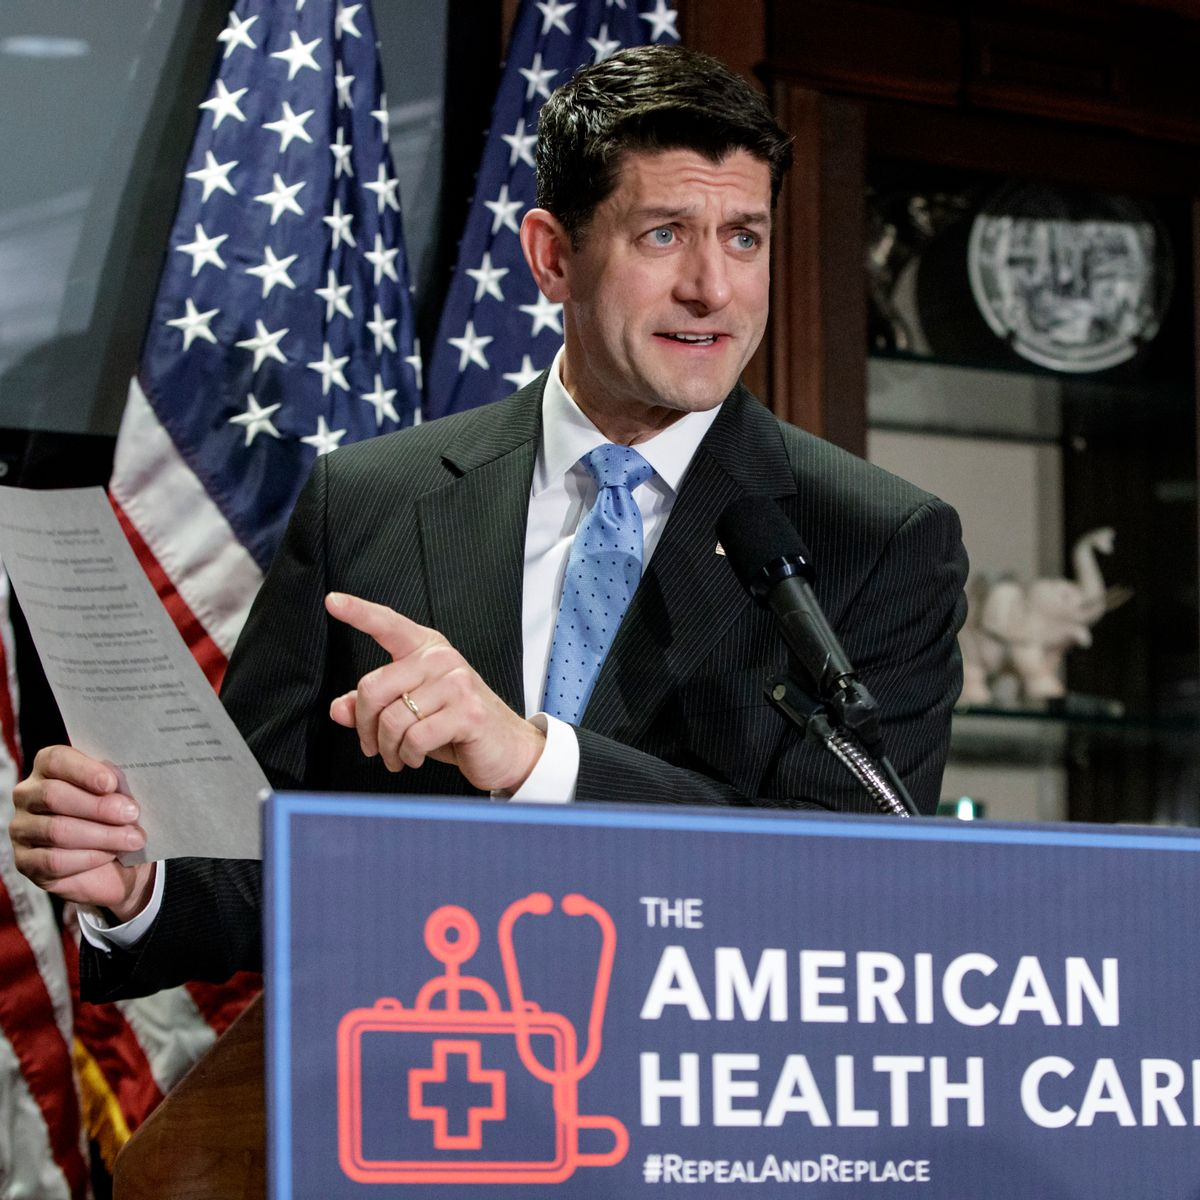 Has the Trump budget blown Republican's cover?